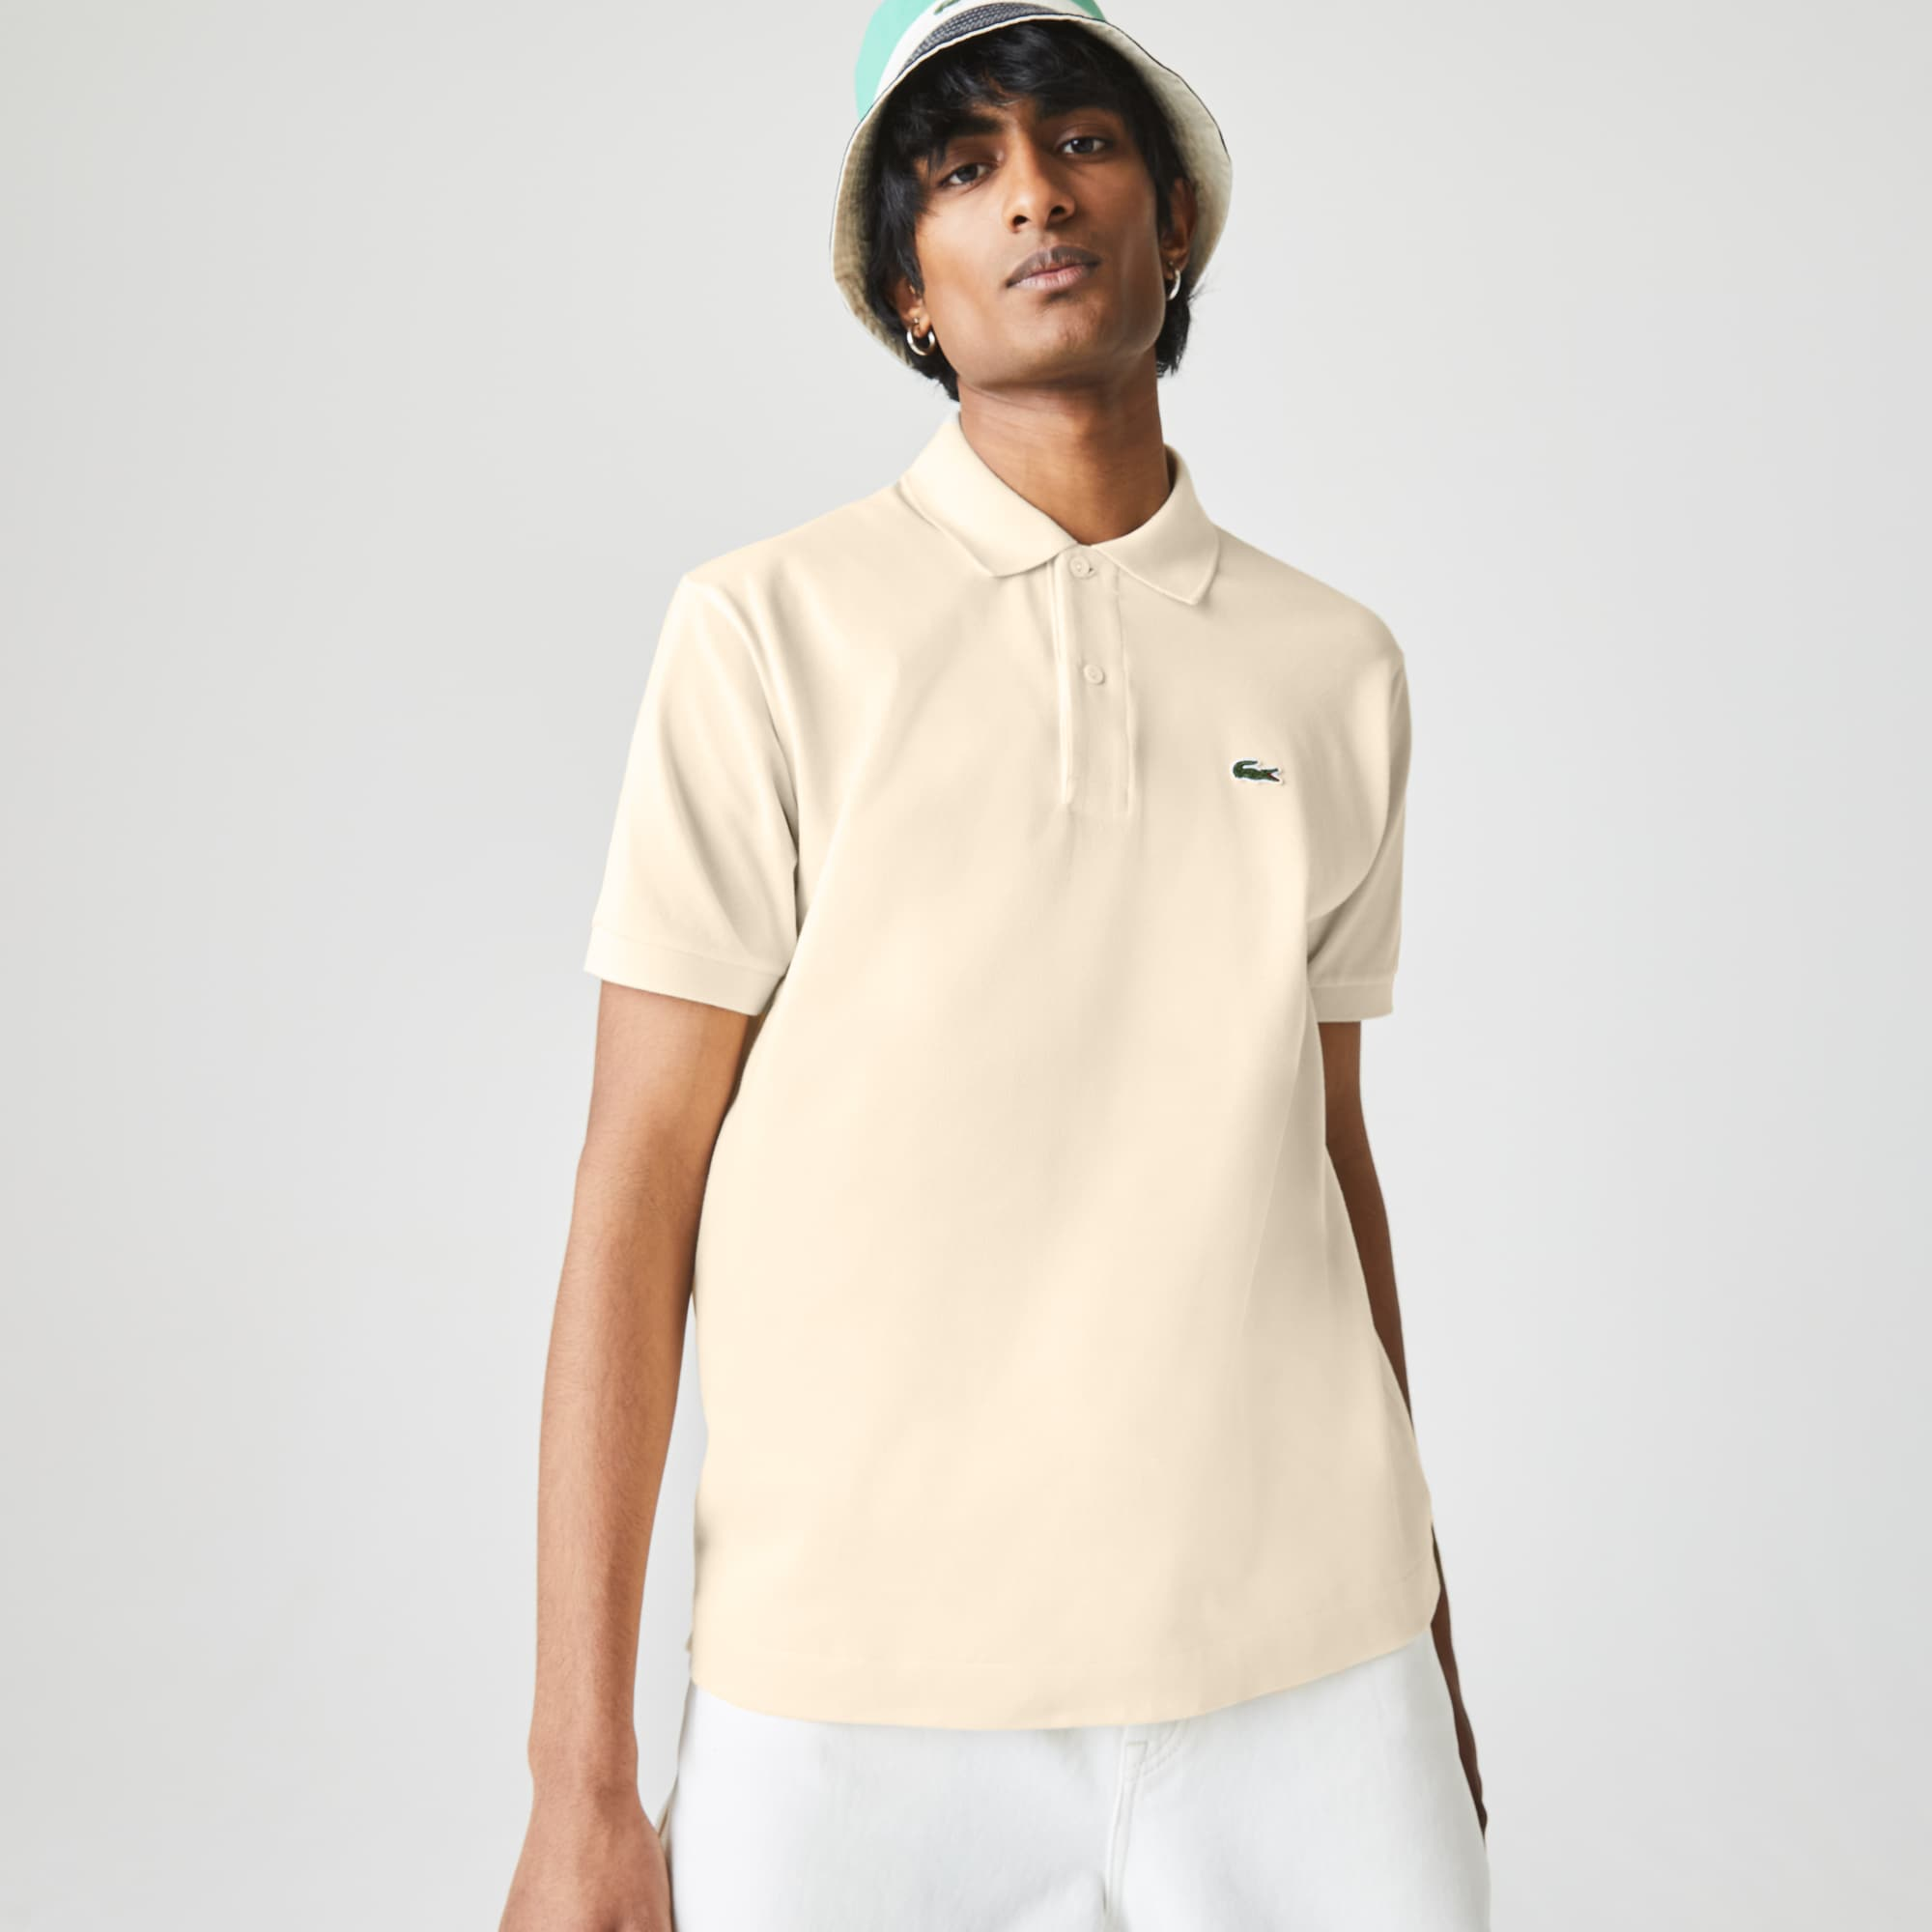 Men's Polo Shirts | Lacoste Polo Shirts for Men | LACOSTE